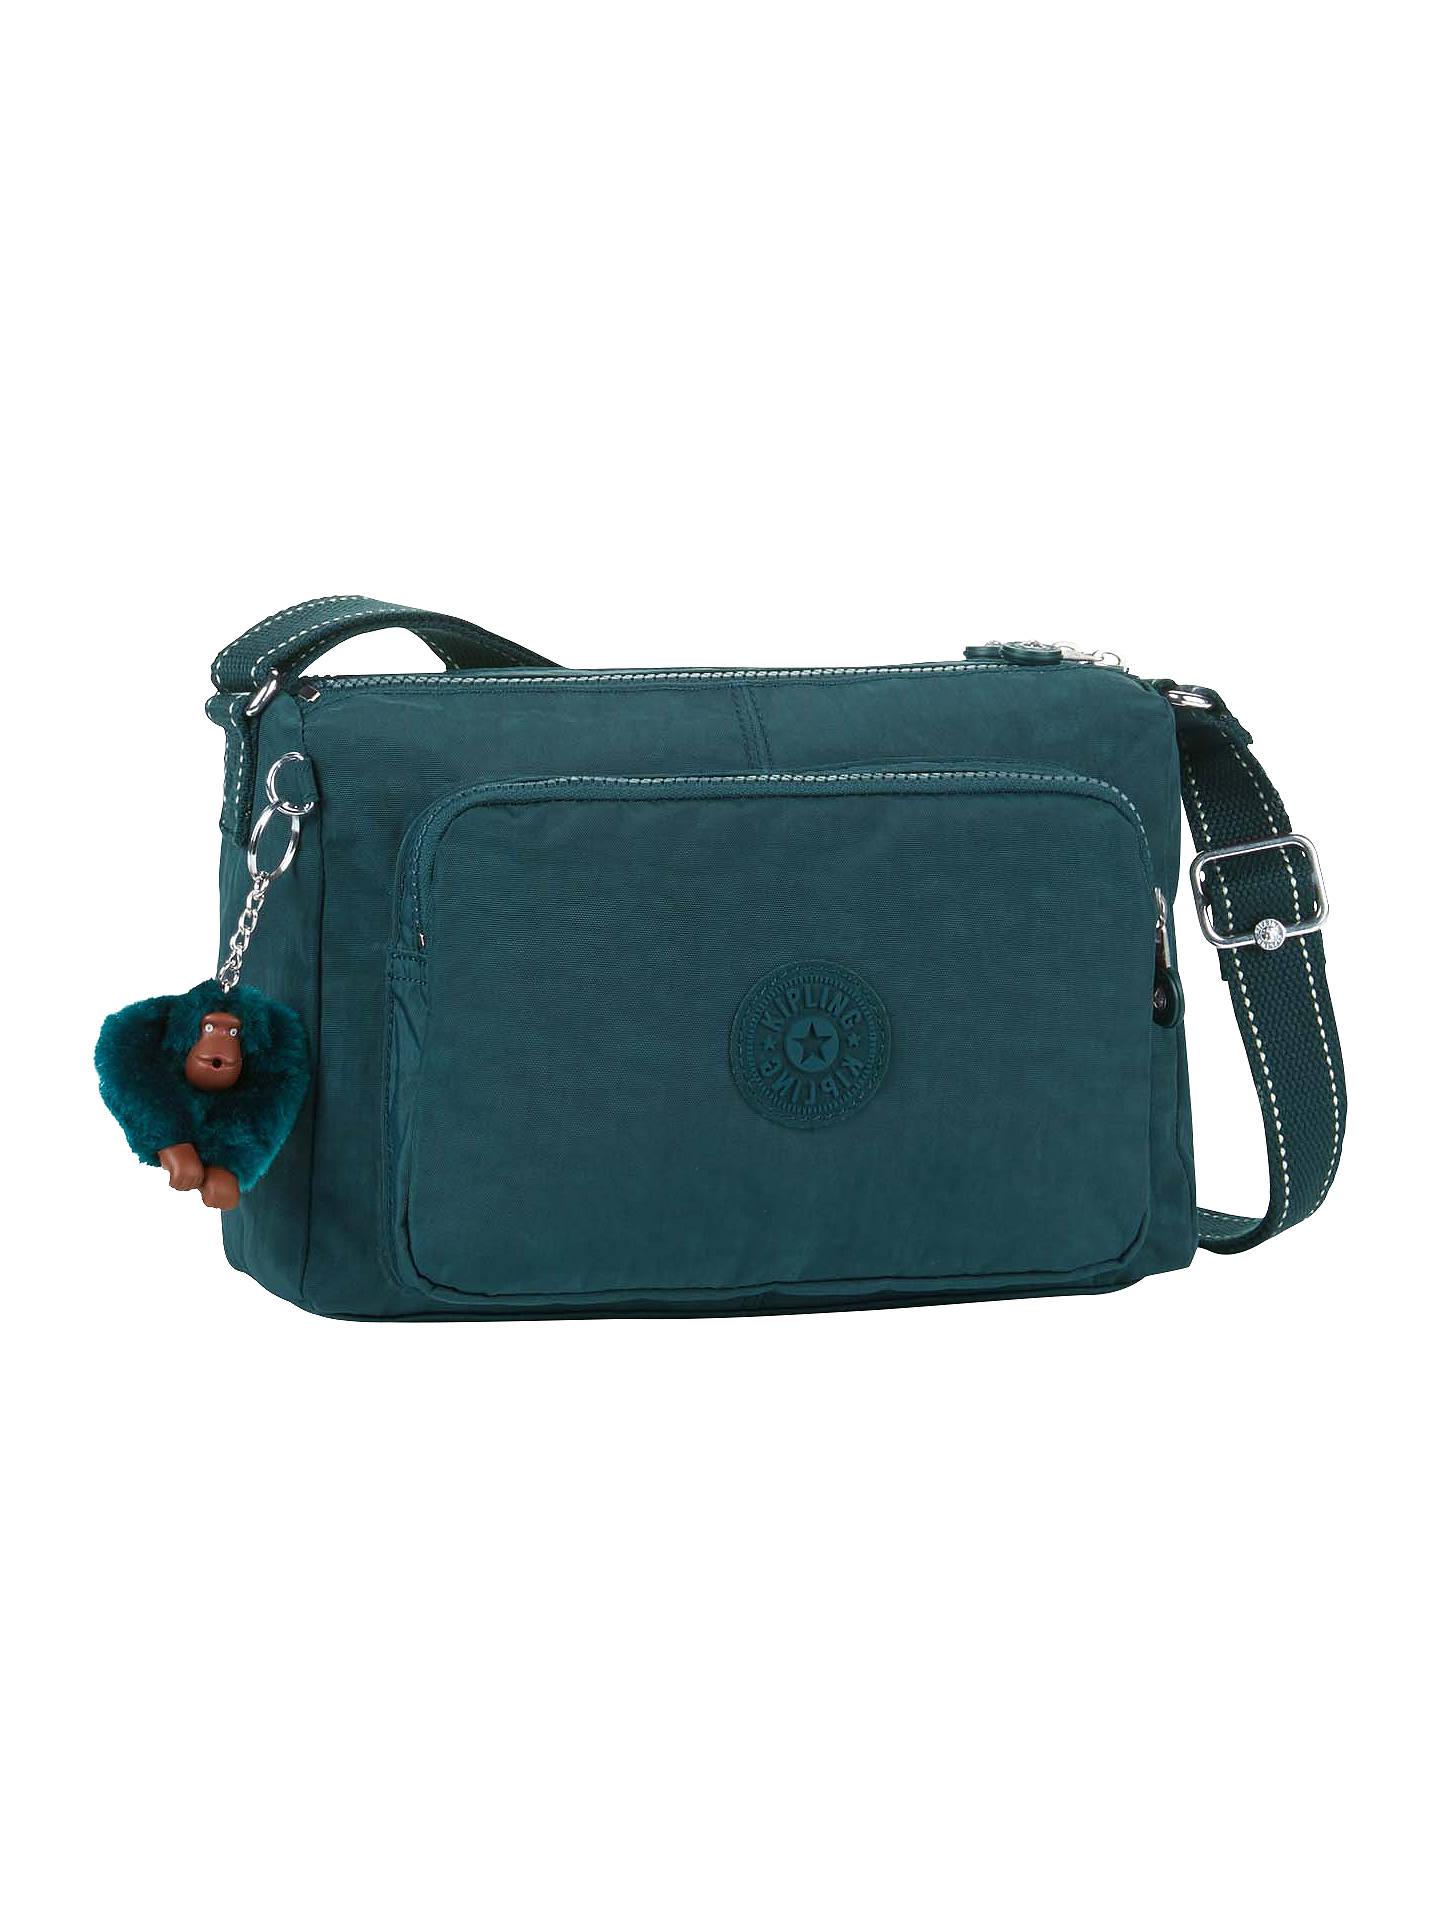 d1009fa453a Buy Kipling Reth Shoulder Bag, Deep Emerald Online at johnlewis.com ...